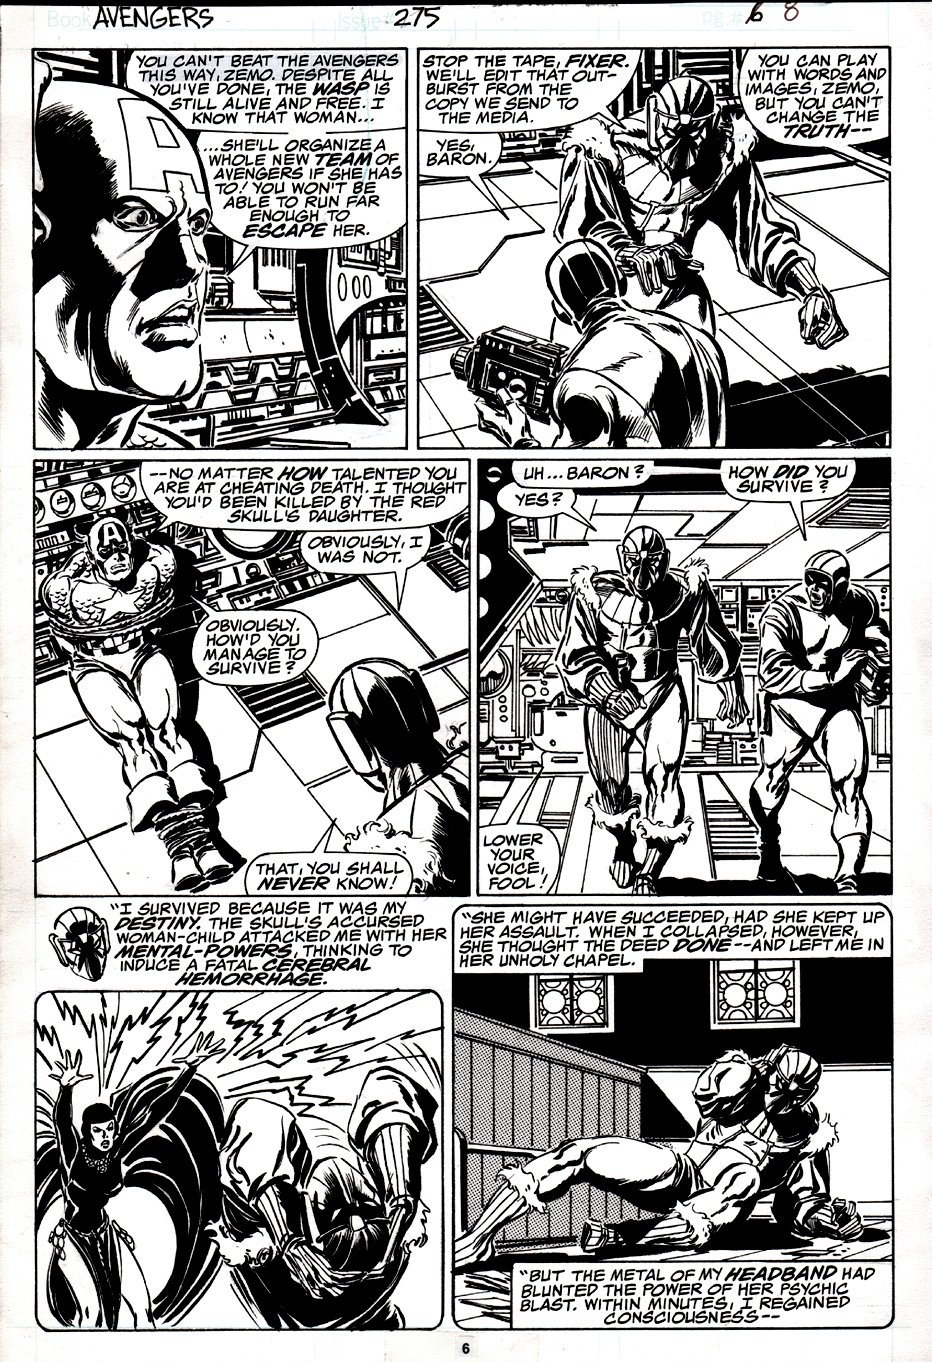 Avengers #275 p 6 (CAPTAIN AMERICA / BARON ZEMO / FIXER!) 1986